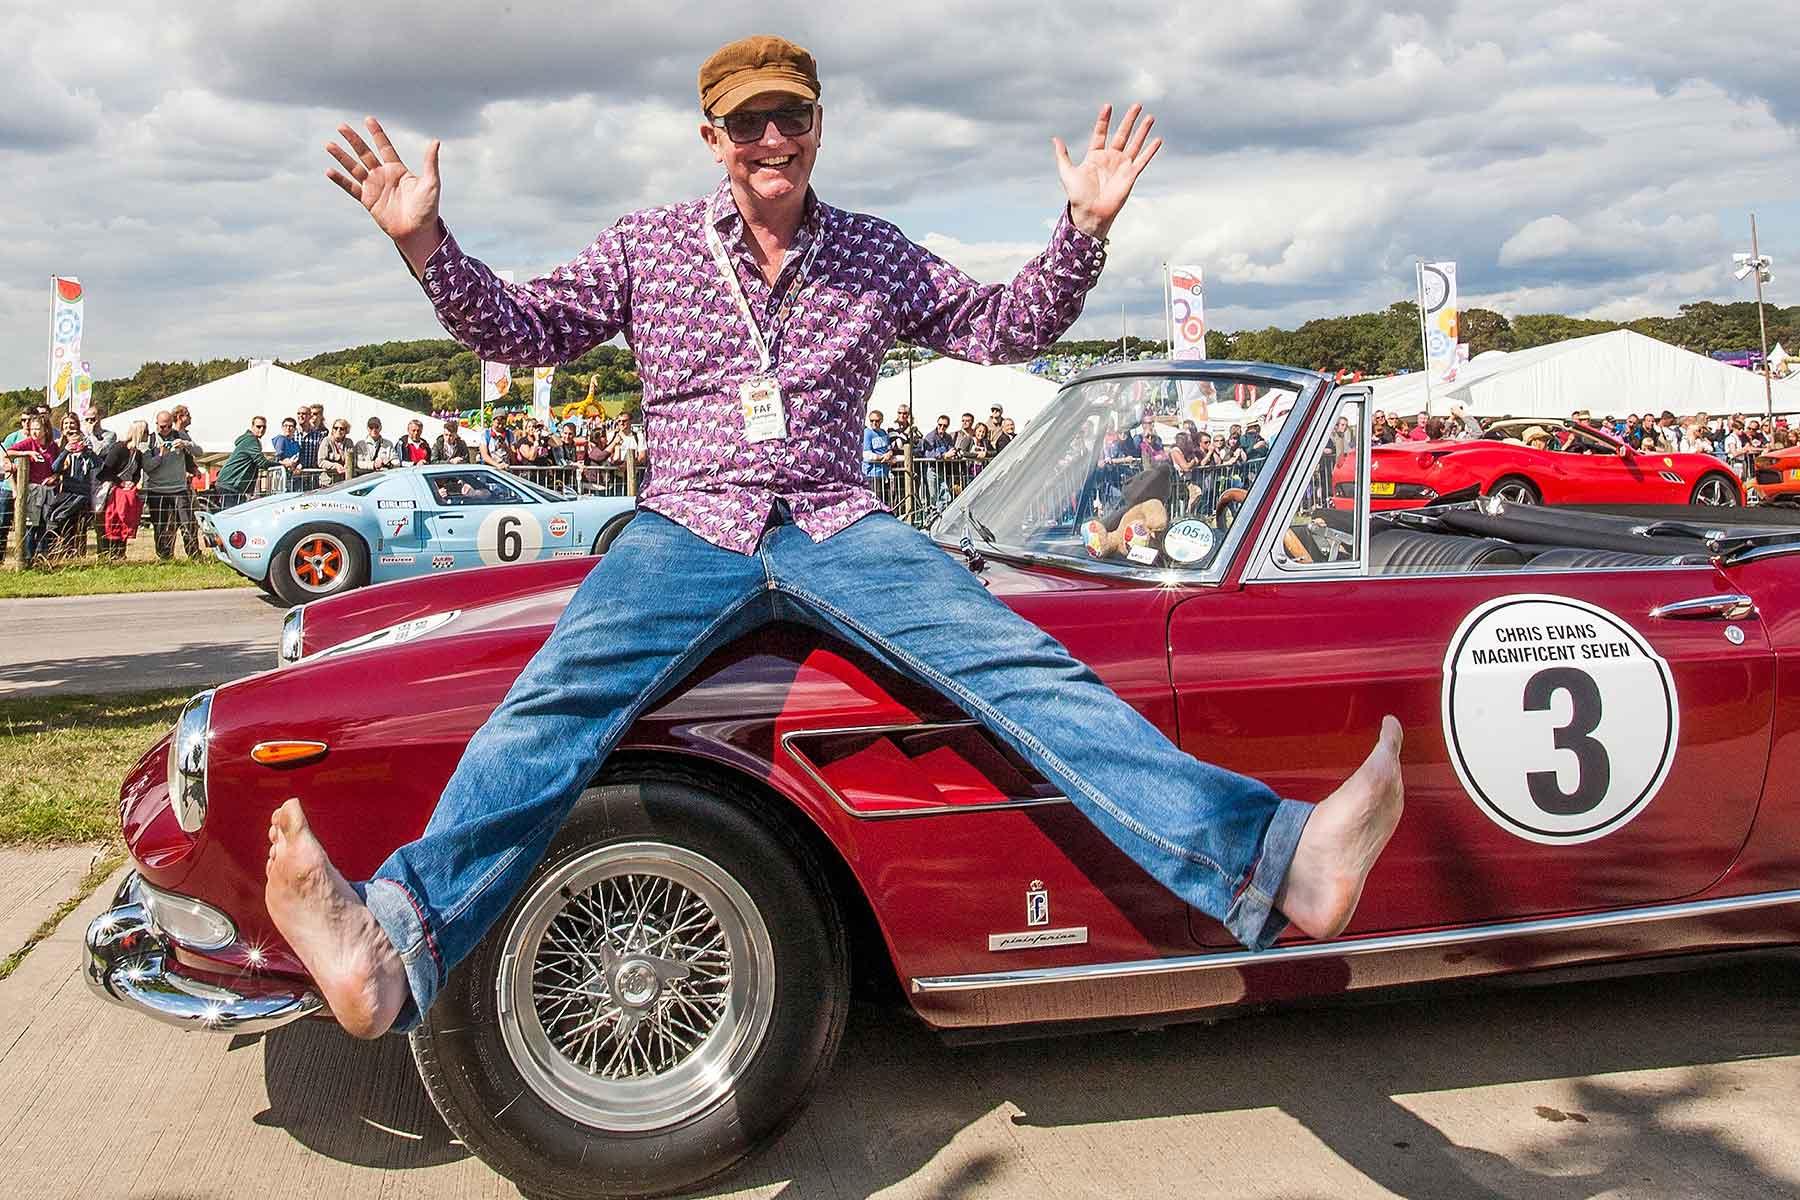 Chris Evans CarFest